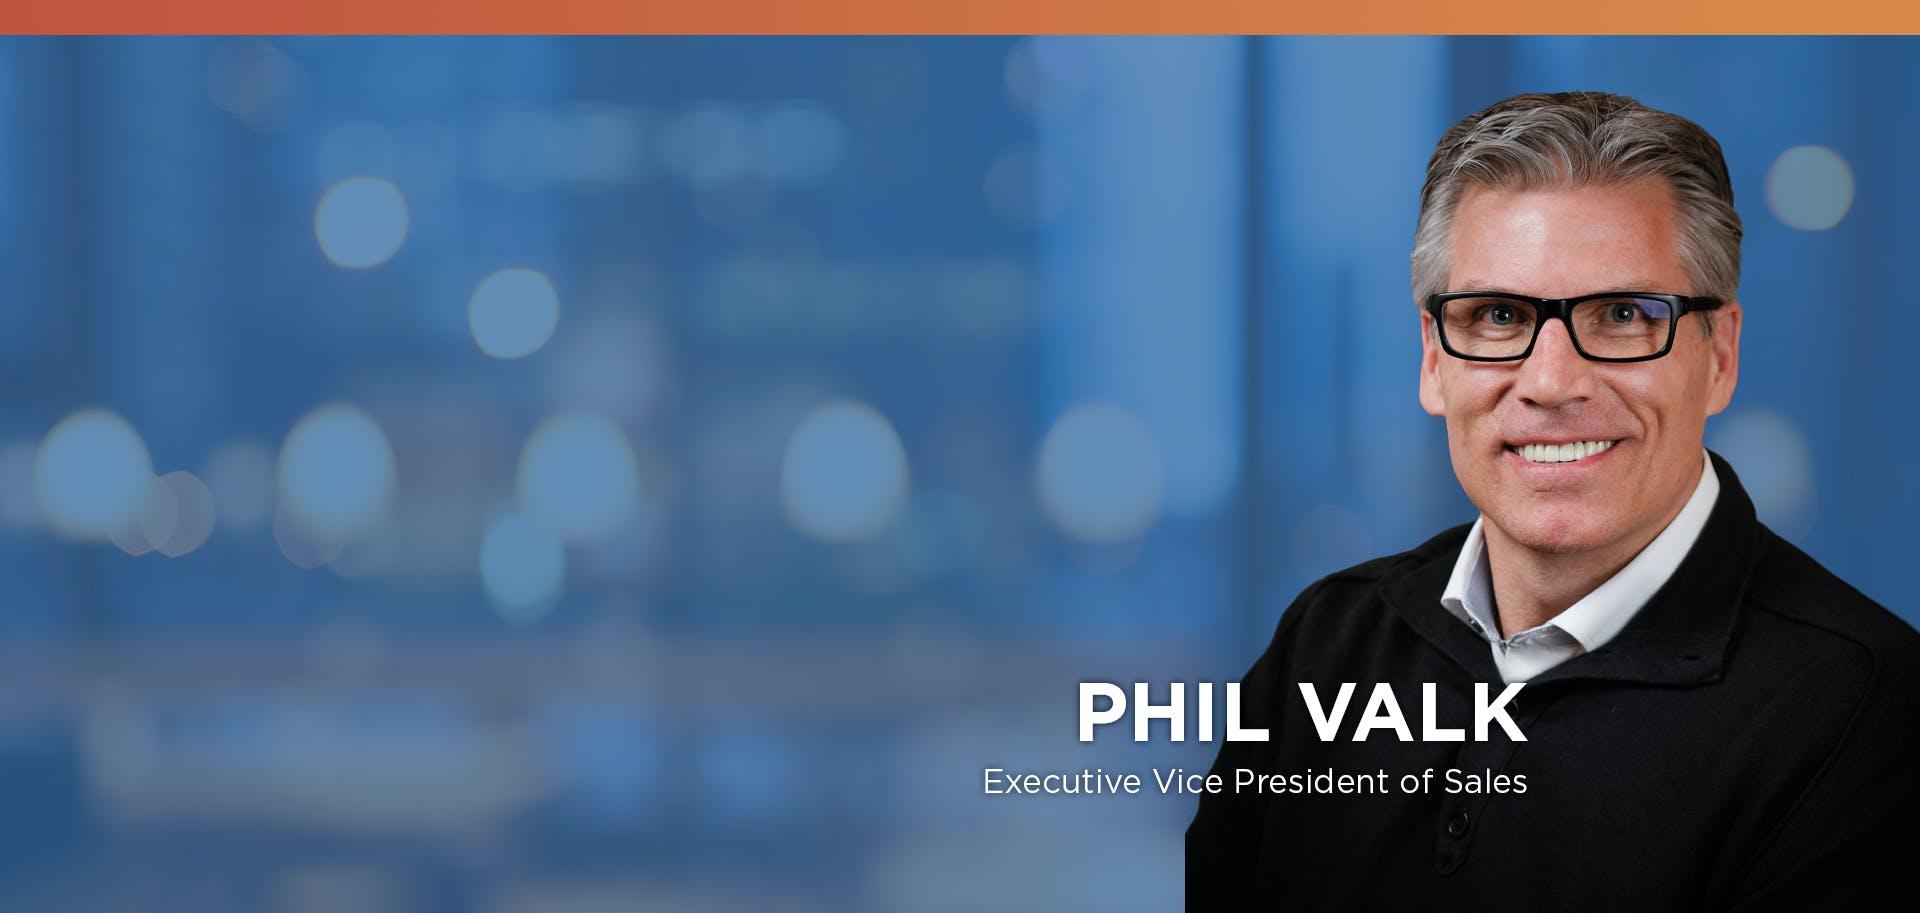 Fairos Names Phil Valk Executive Vice President of Sales